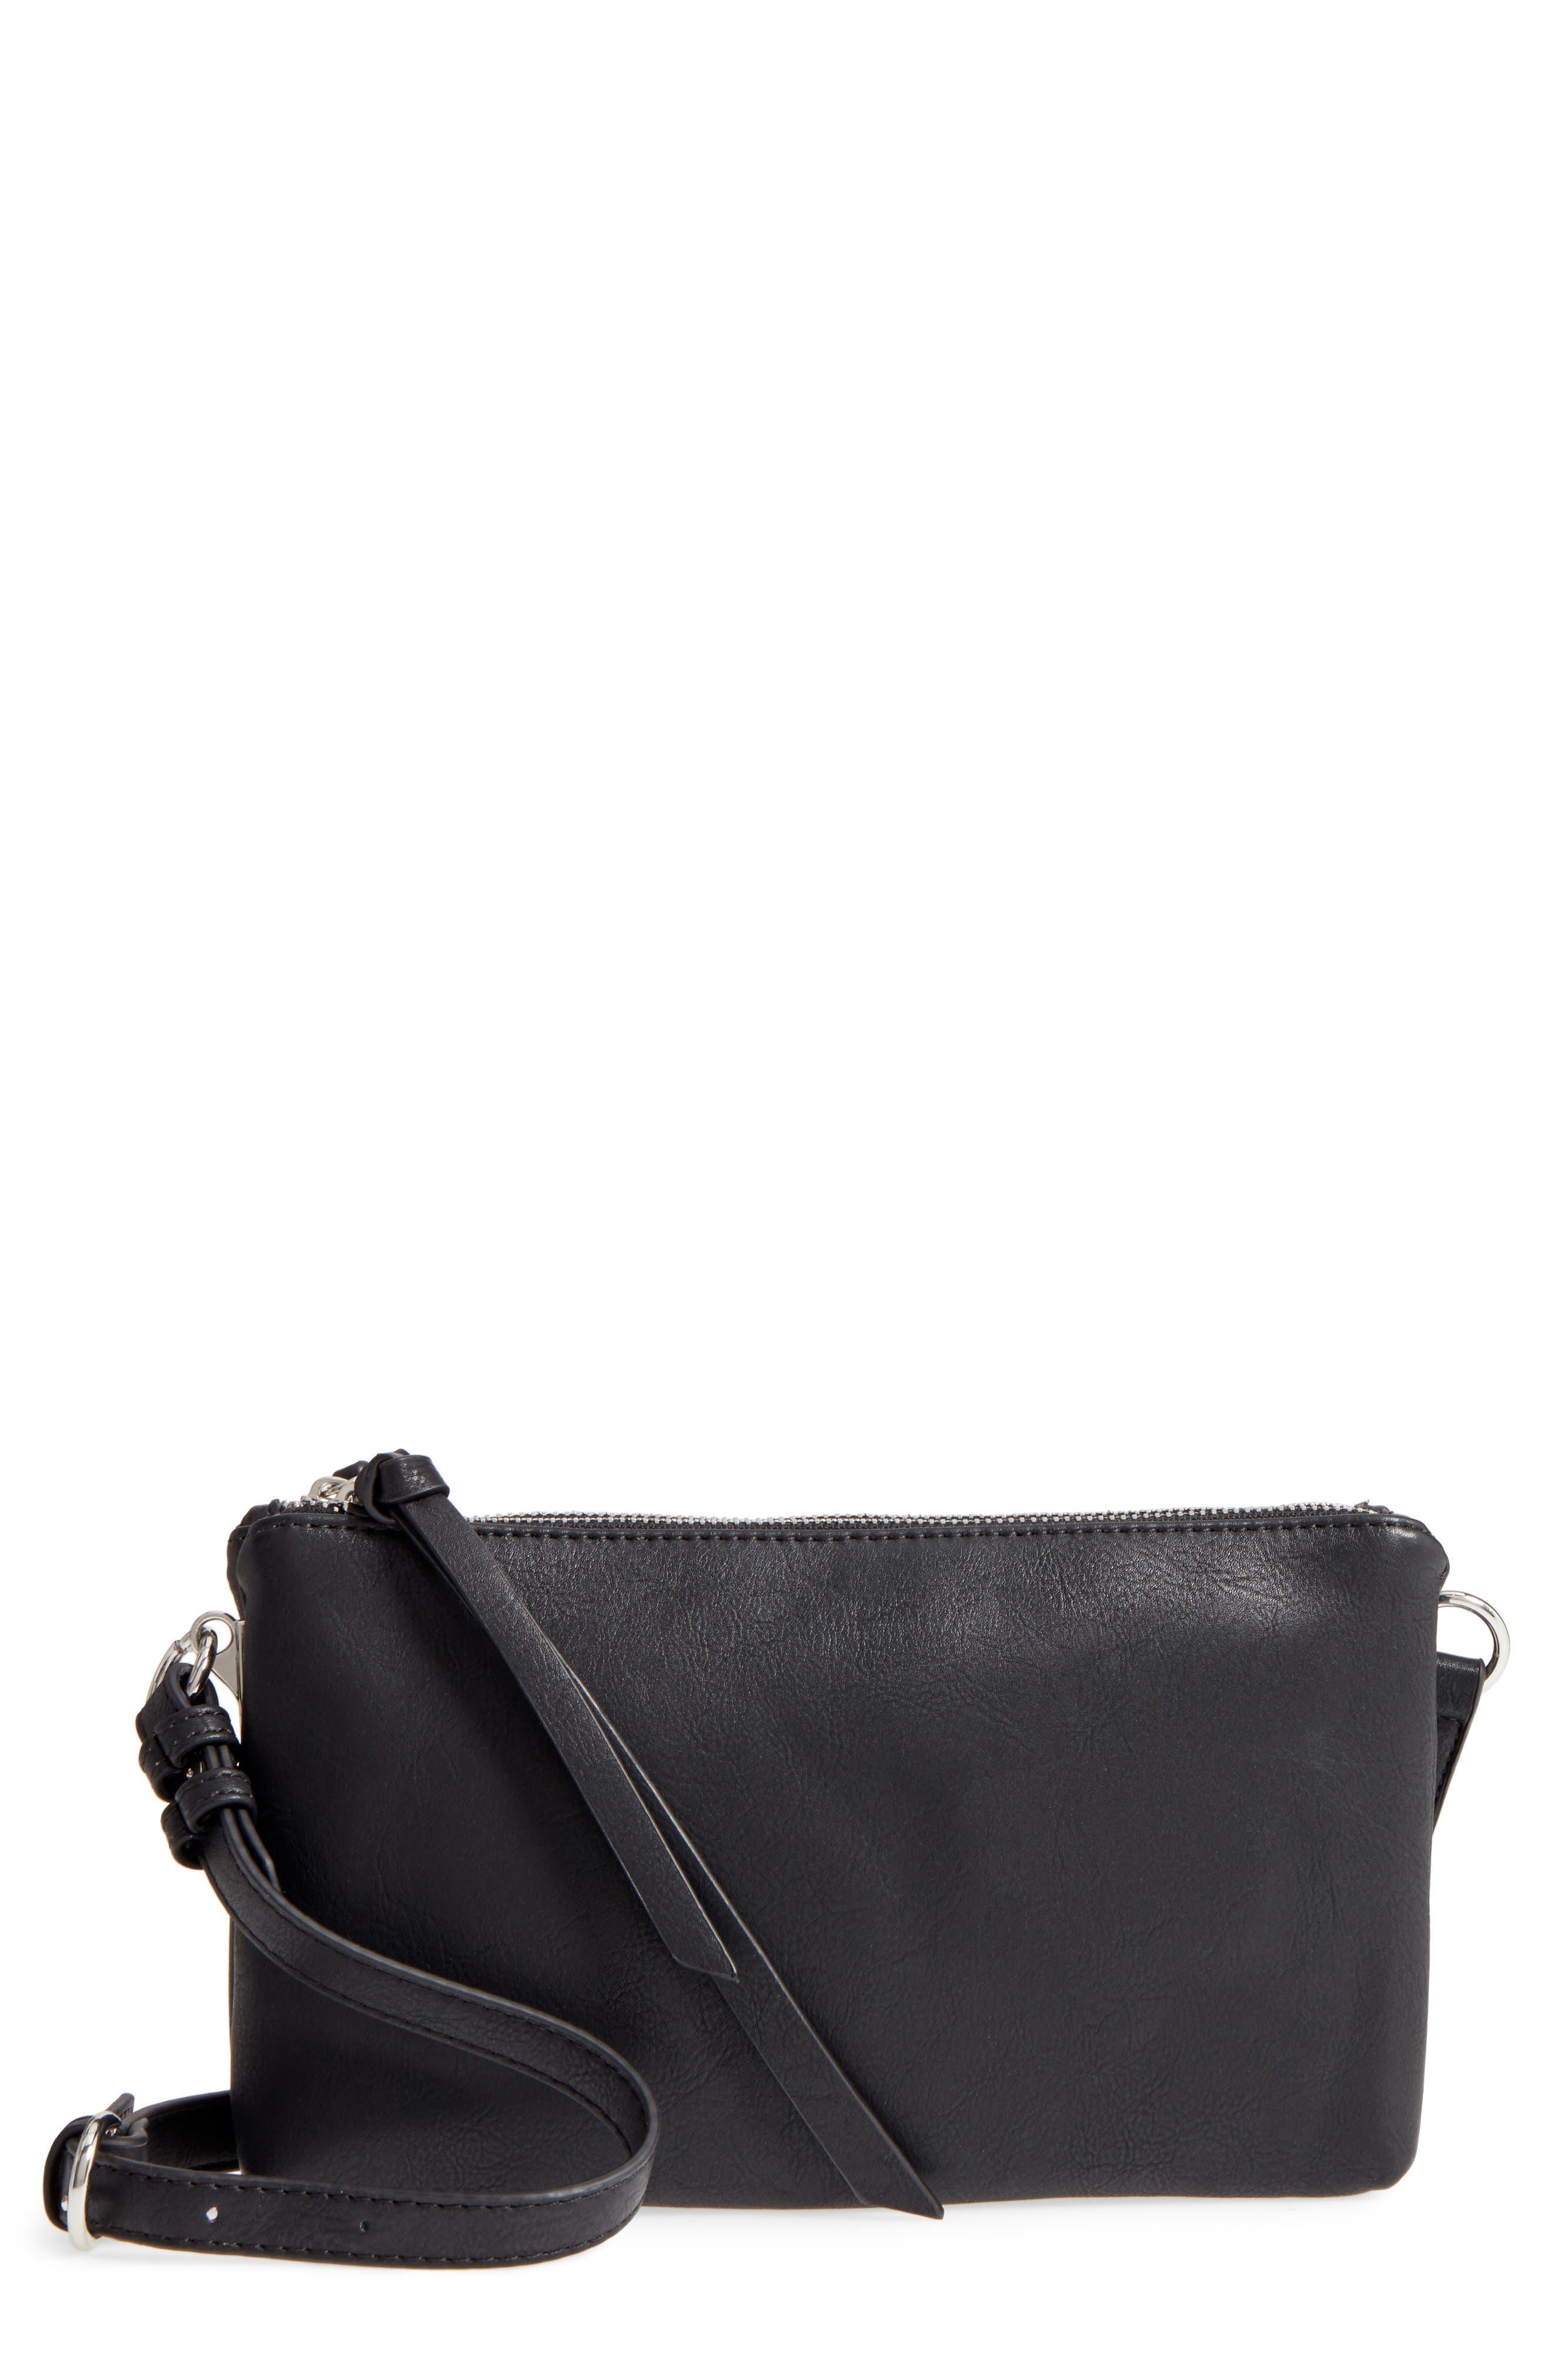 Kia Double Zip Faux Leather Crossbody Bag,                             Main thumbnail 1, color,                             001